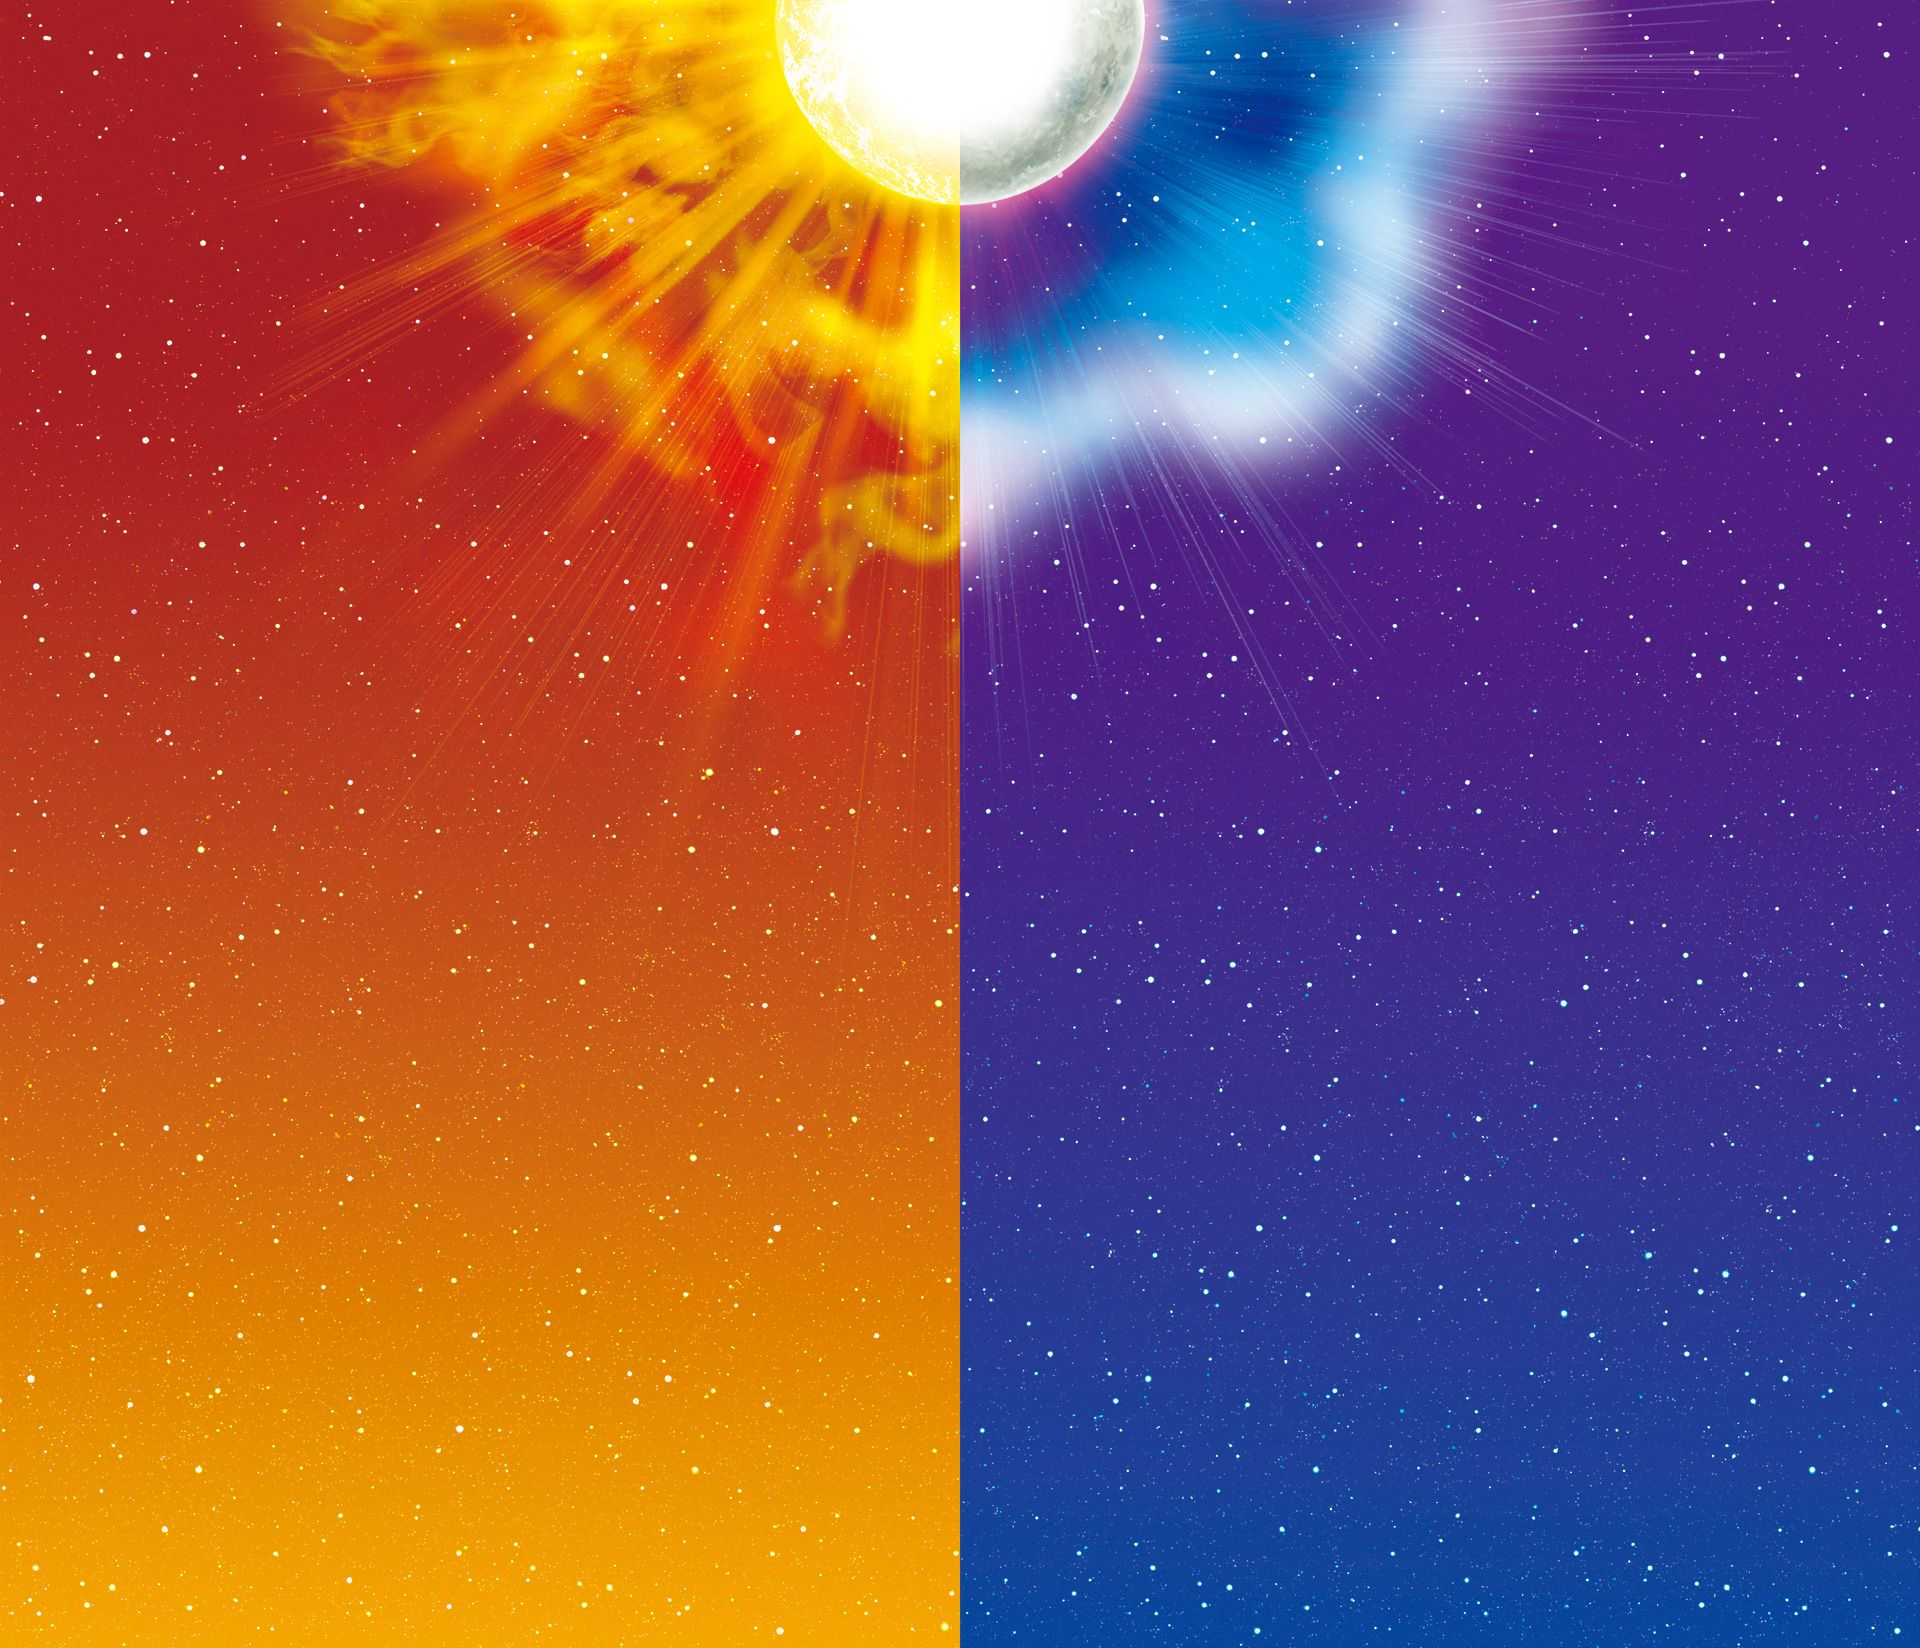 pokémon sun vs pokémon